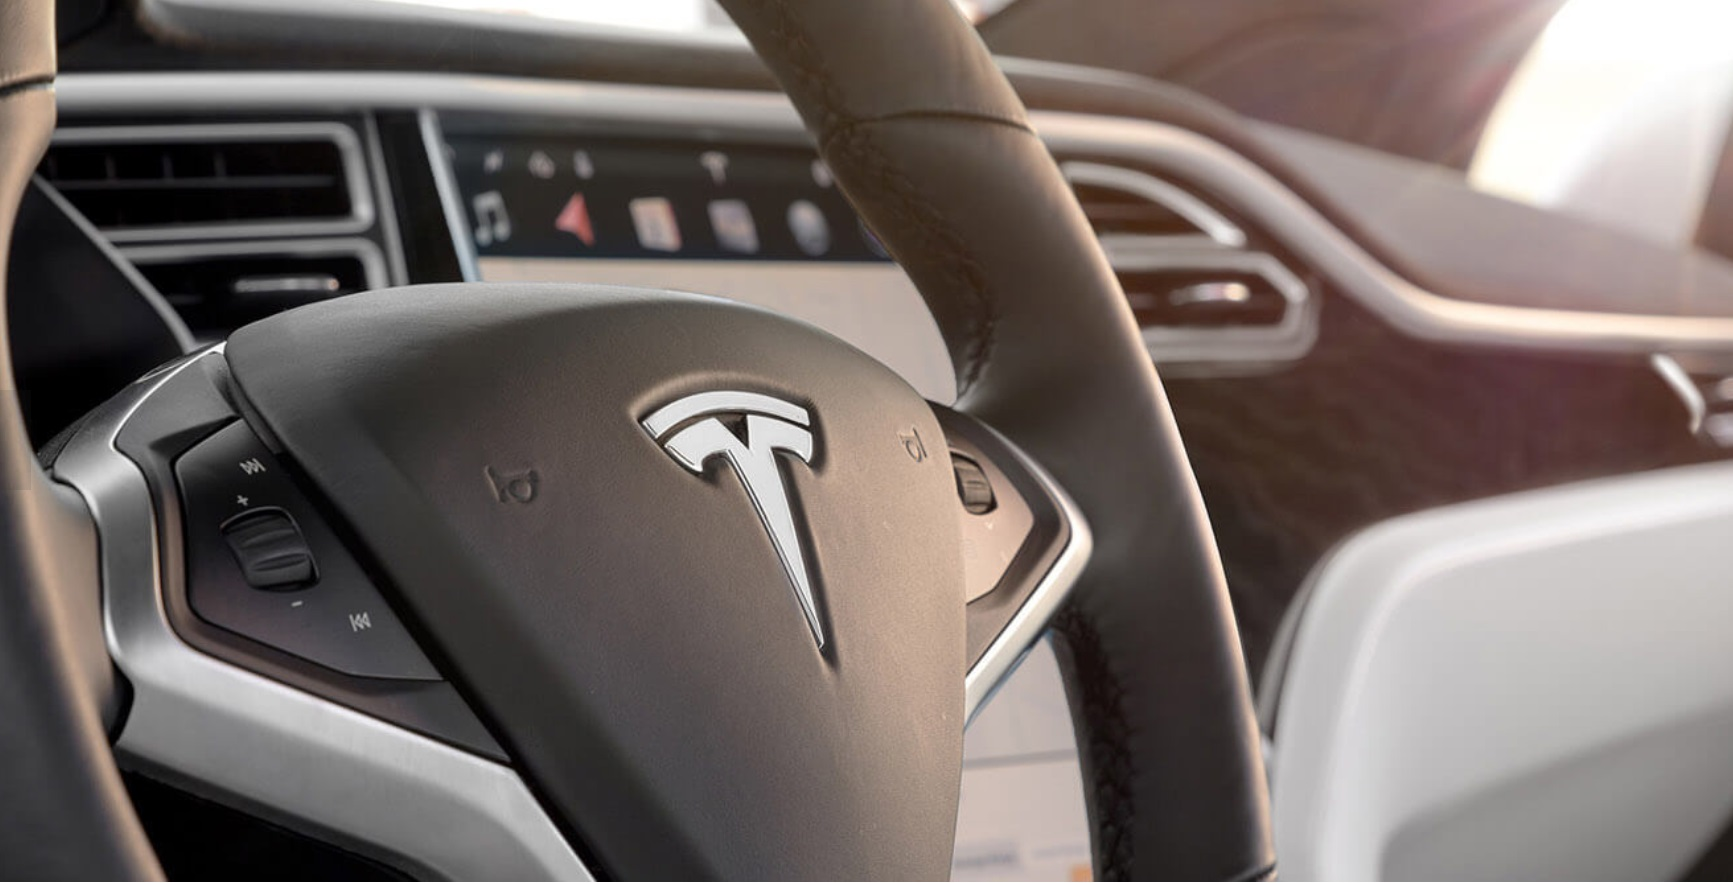 tesla electric-car tax credits, pininfarina electric-car brand, and